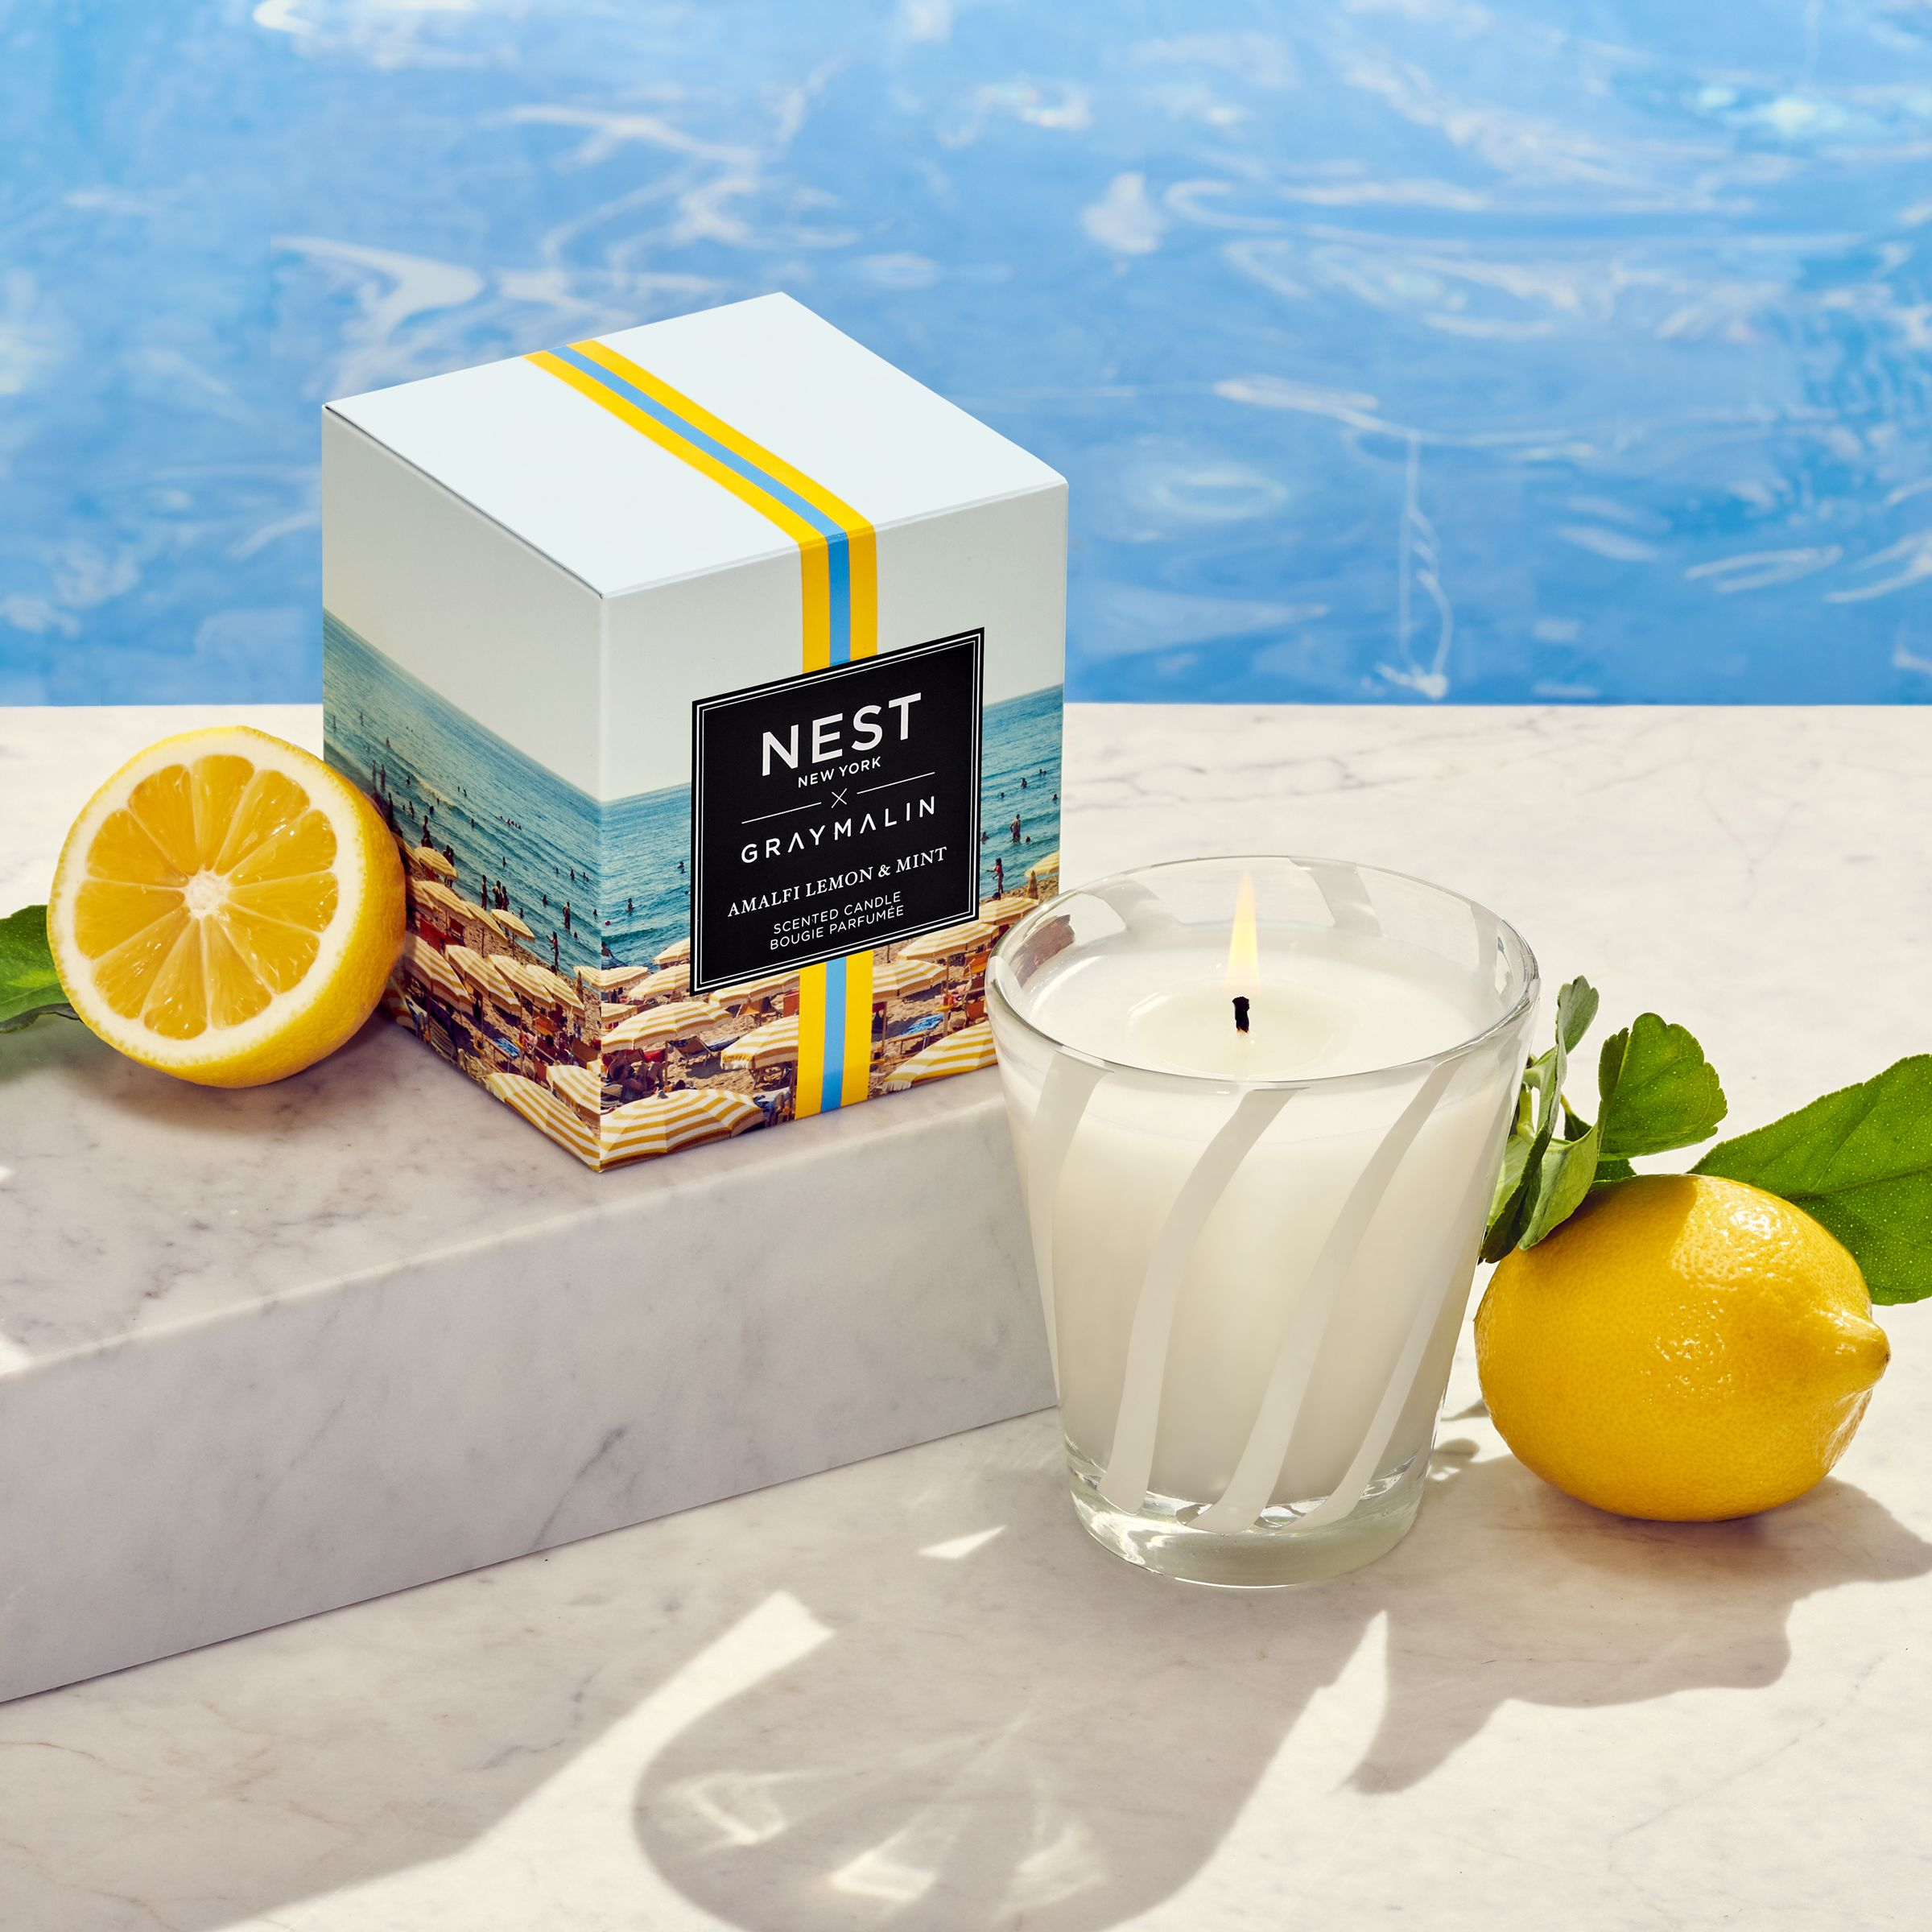 Amalfi Mint & Lemon Candle